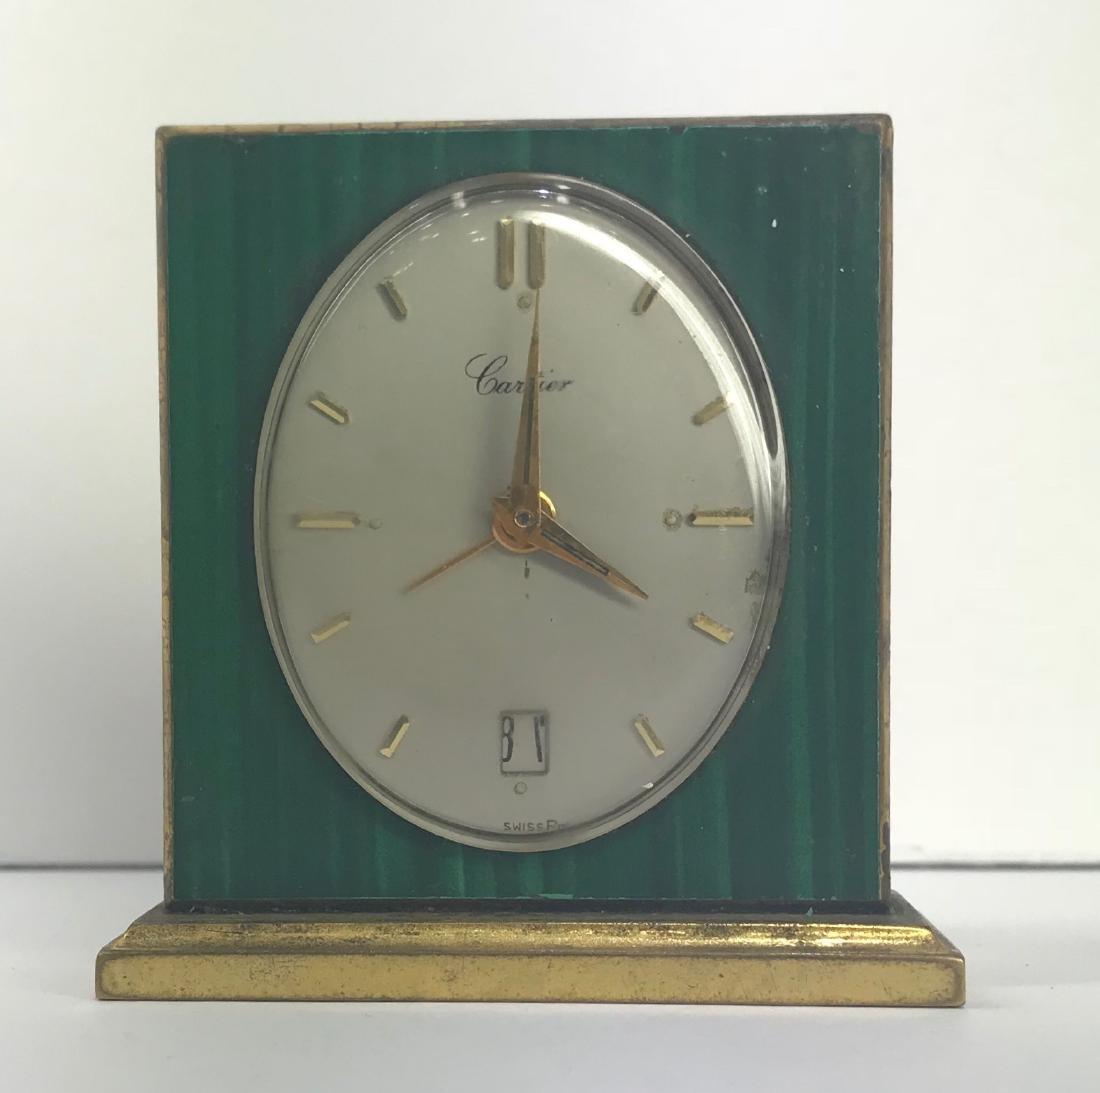 Vintage Cartier desk clock